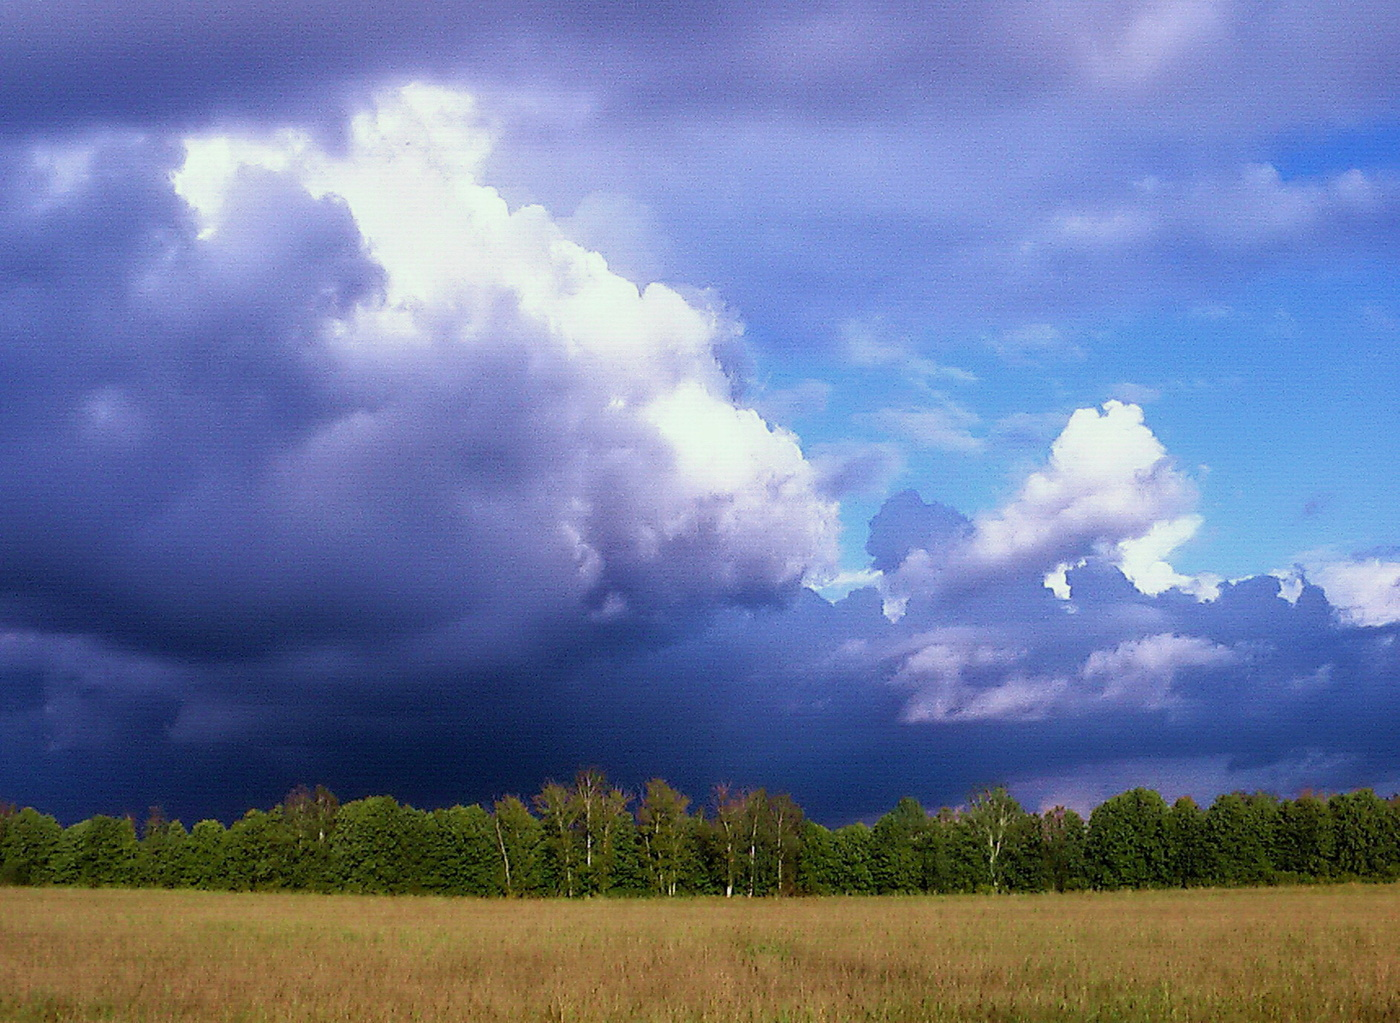 вот фото облака перед дождем своему